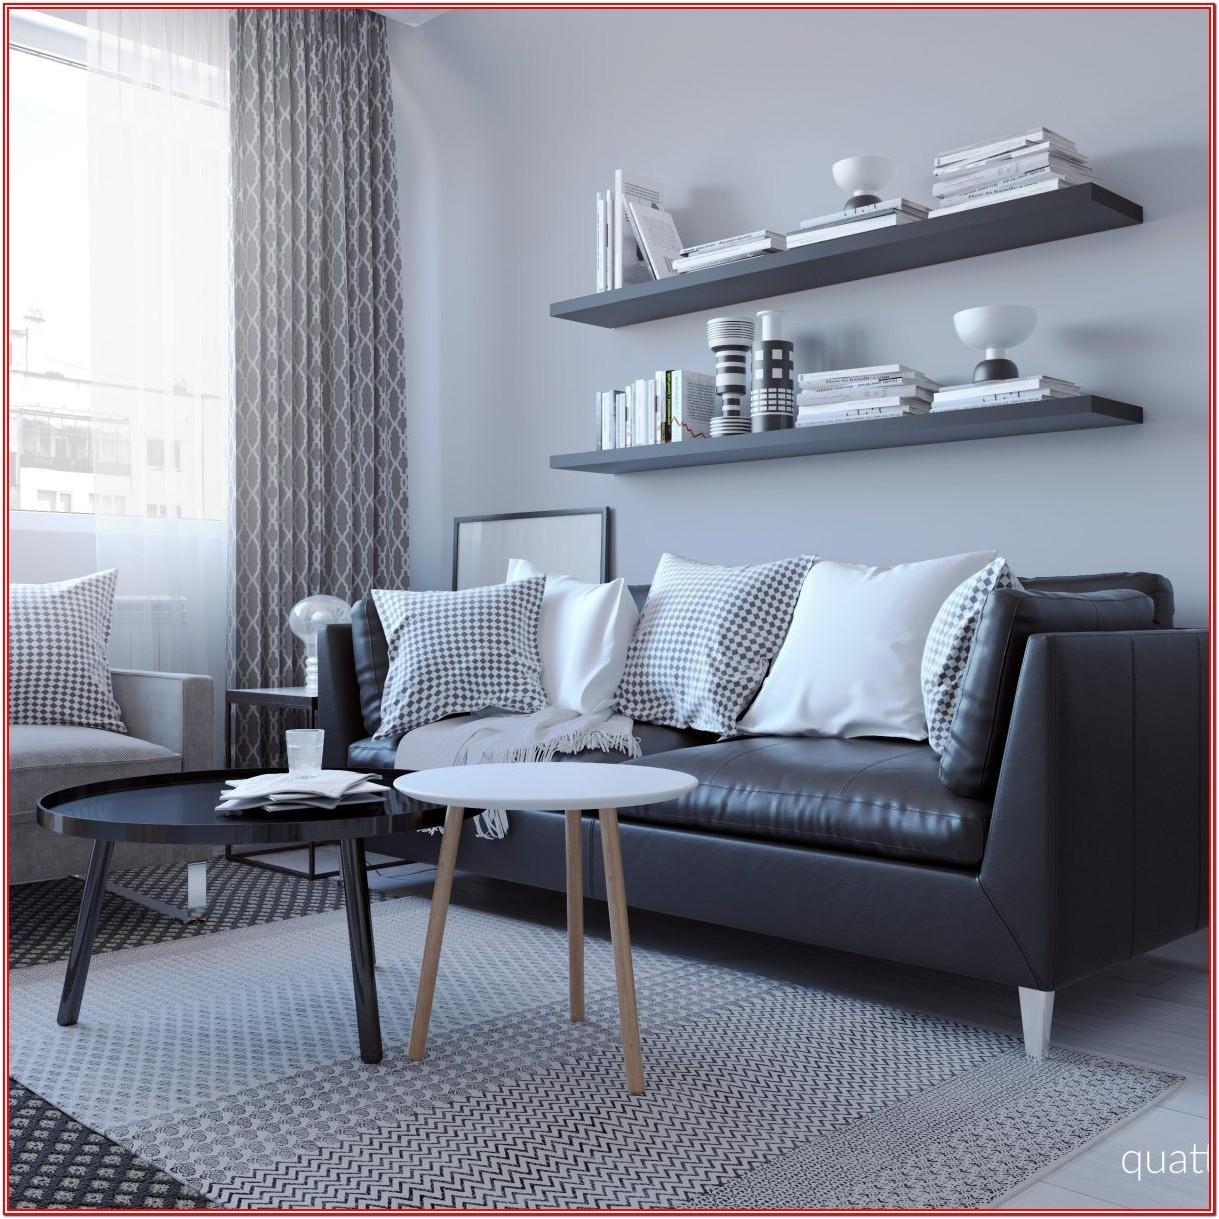 Living Room Idea With Black Sofa